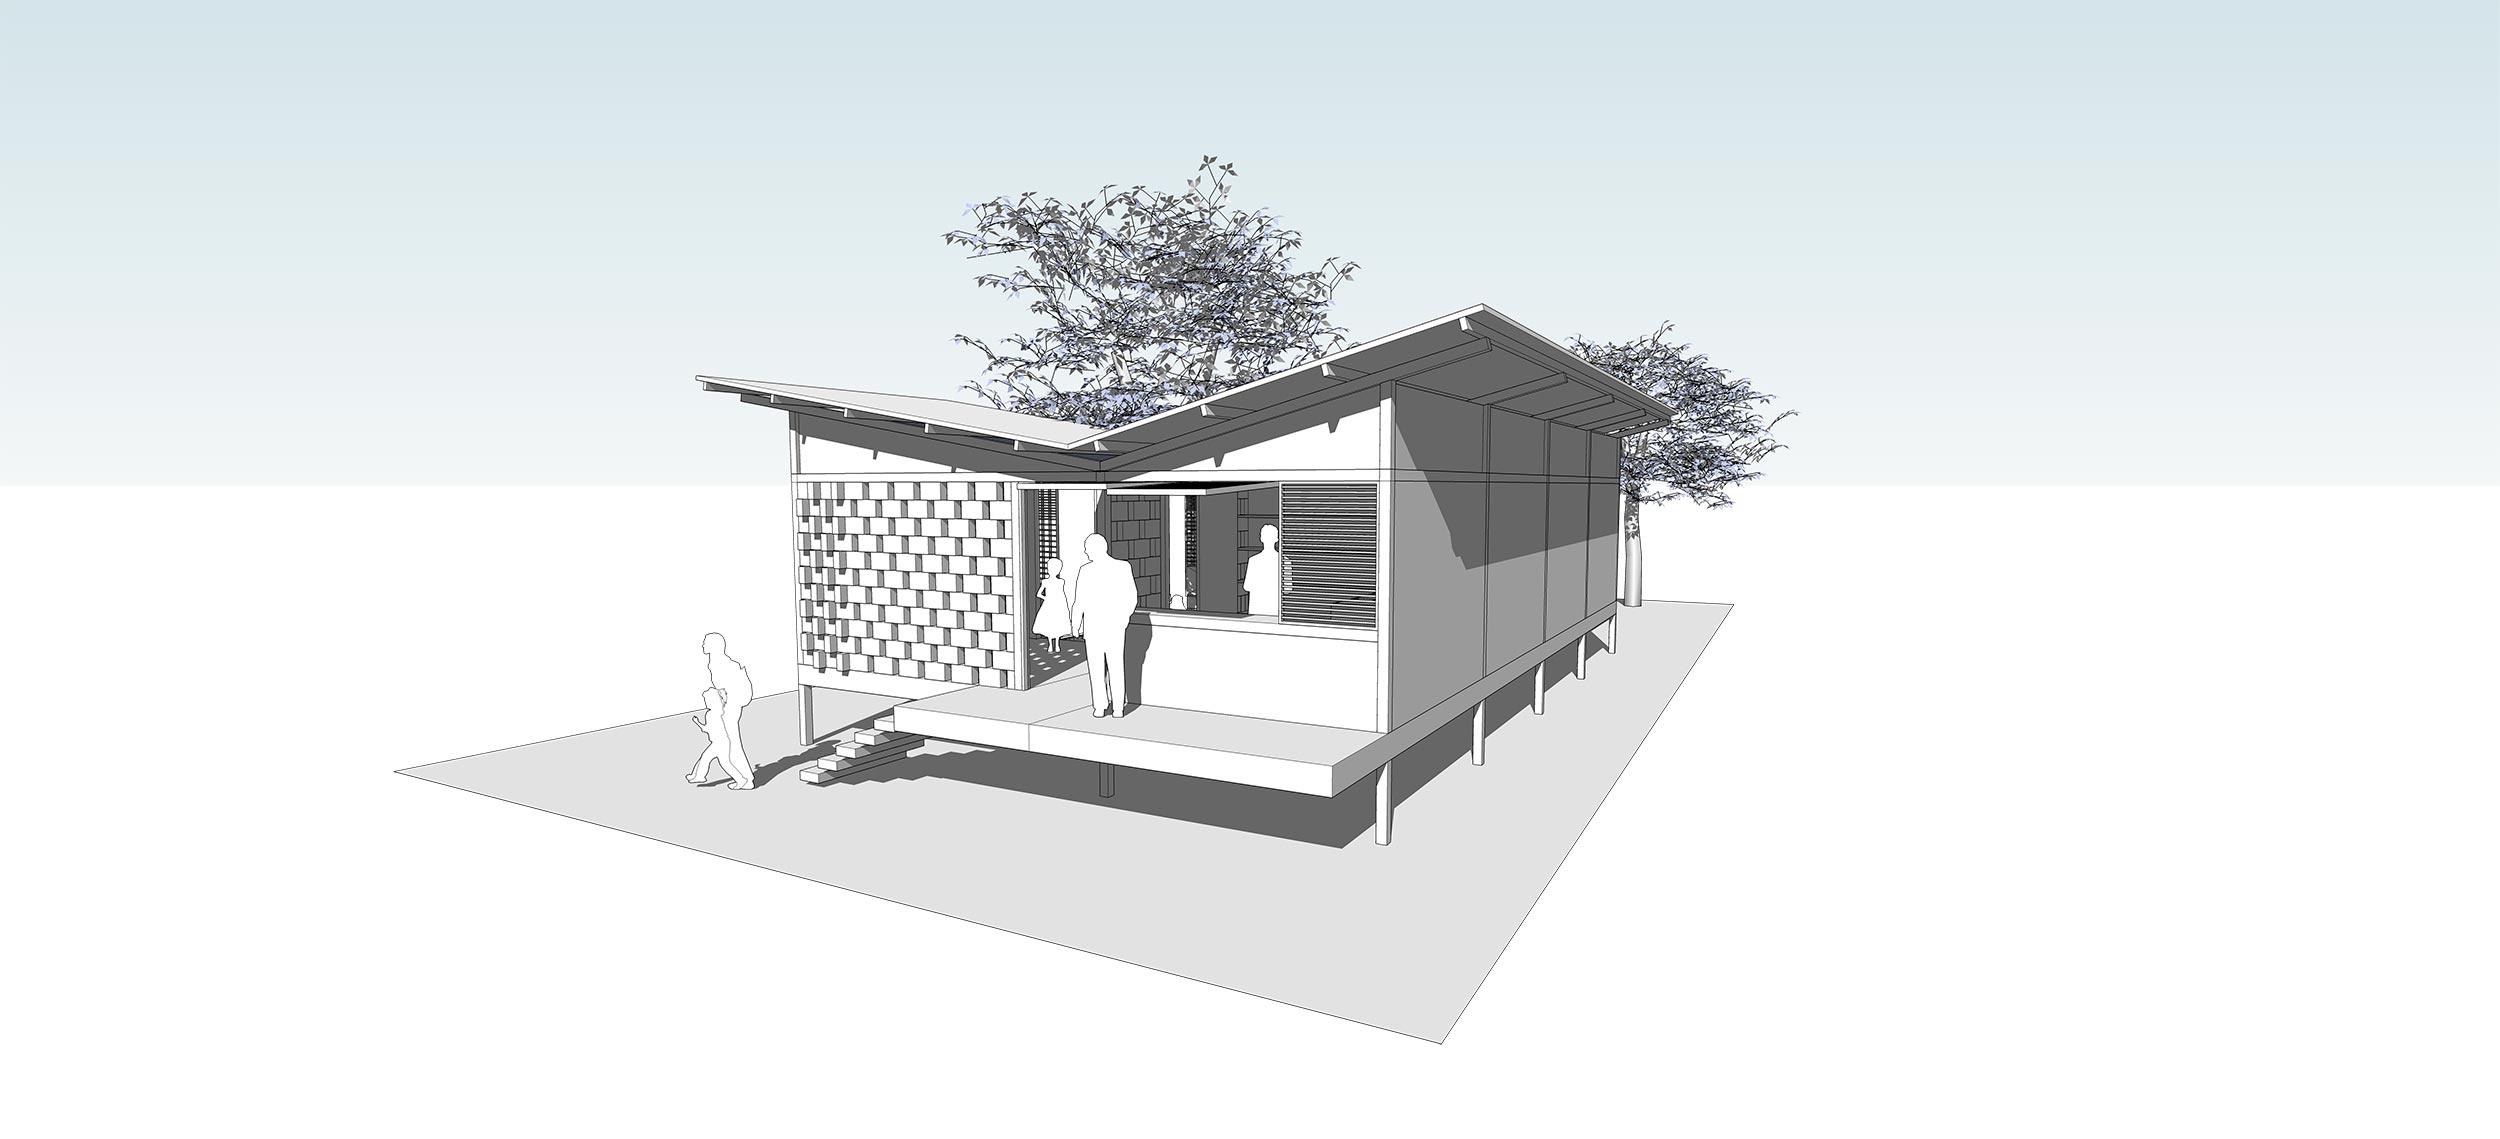 Vivienda de Emergencia - Arquitecnica : Arquitecnica